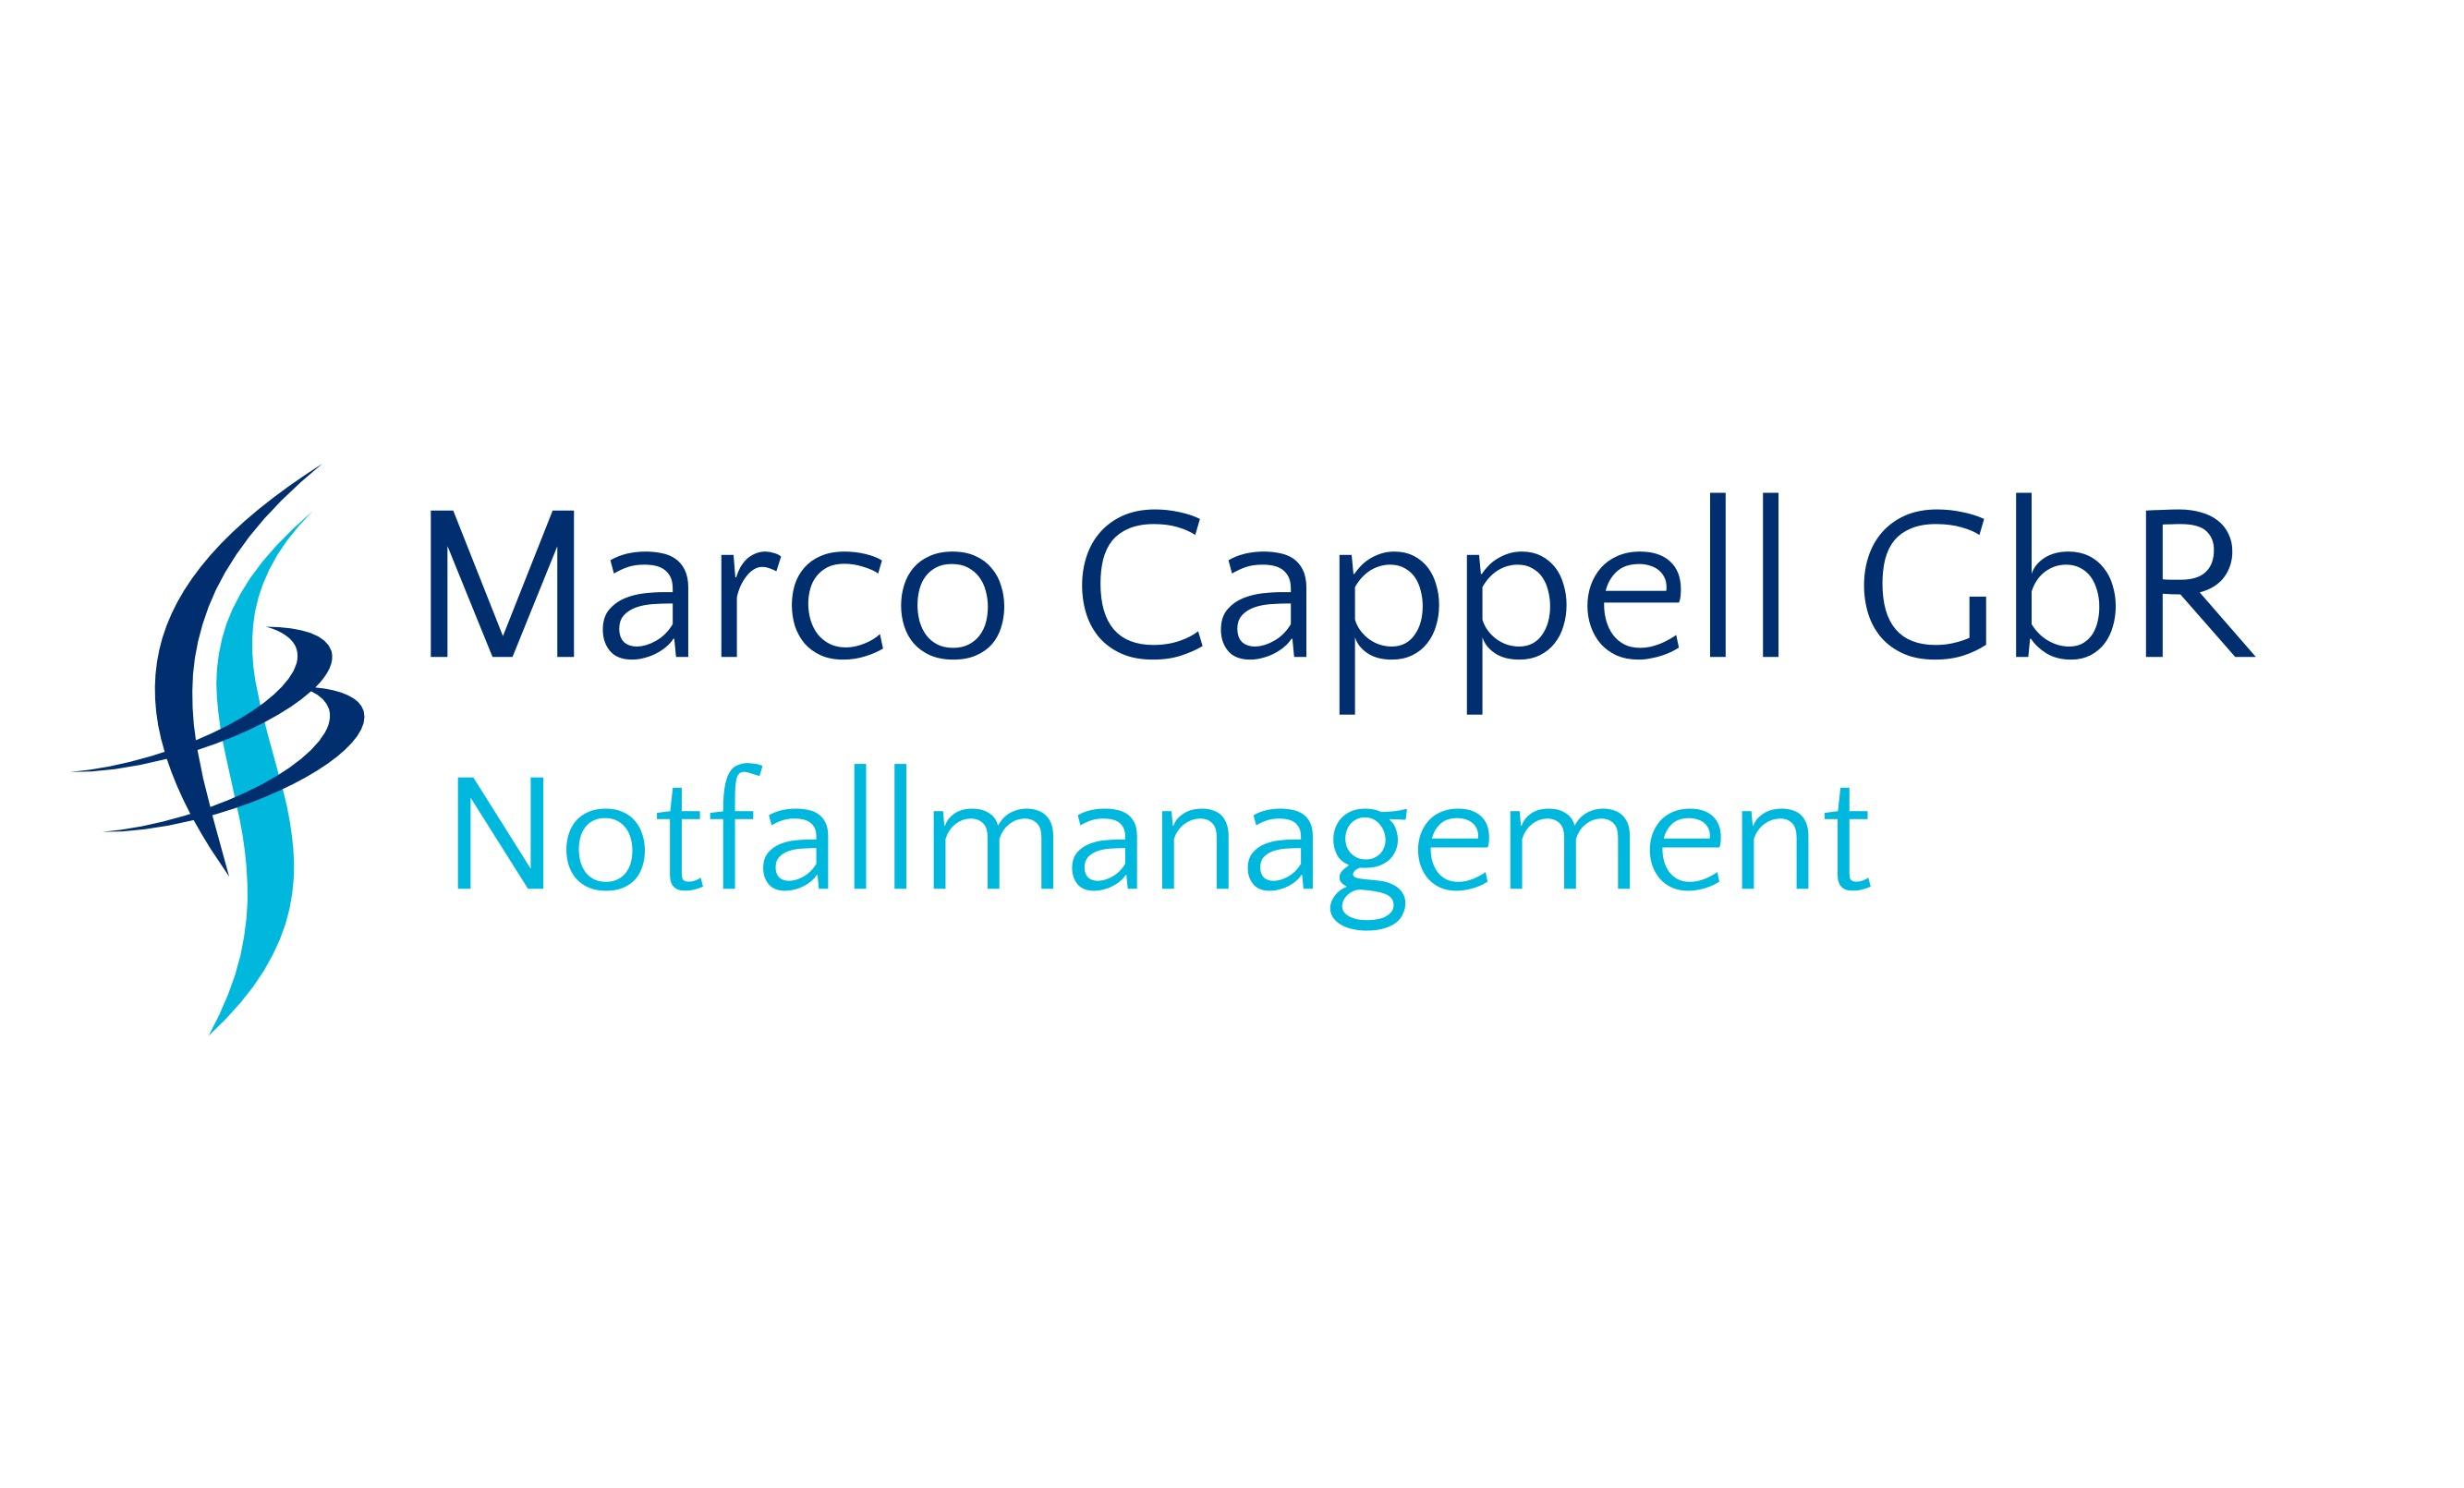 Marco Cappell GbR Notfallmanagement